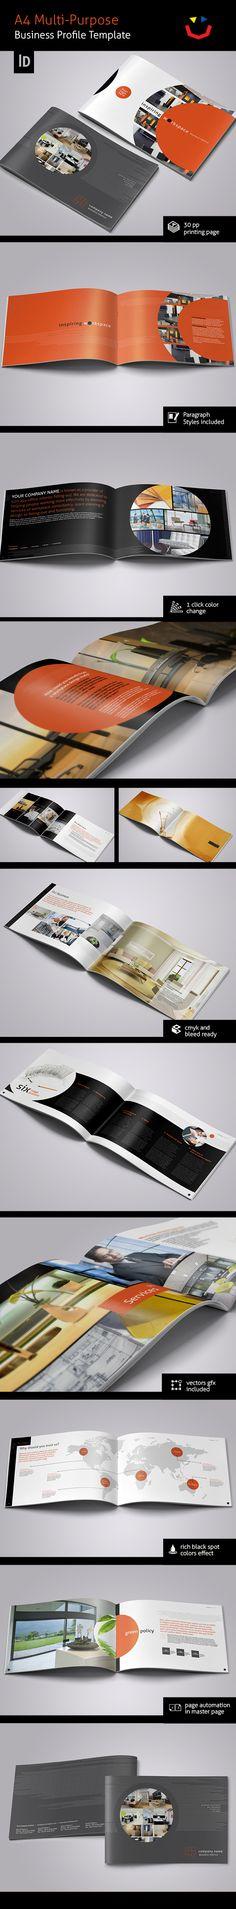 Interior Design Brochure by Jet Paul, via Behance